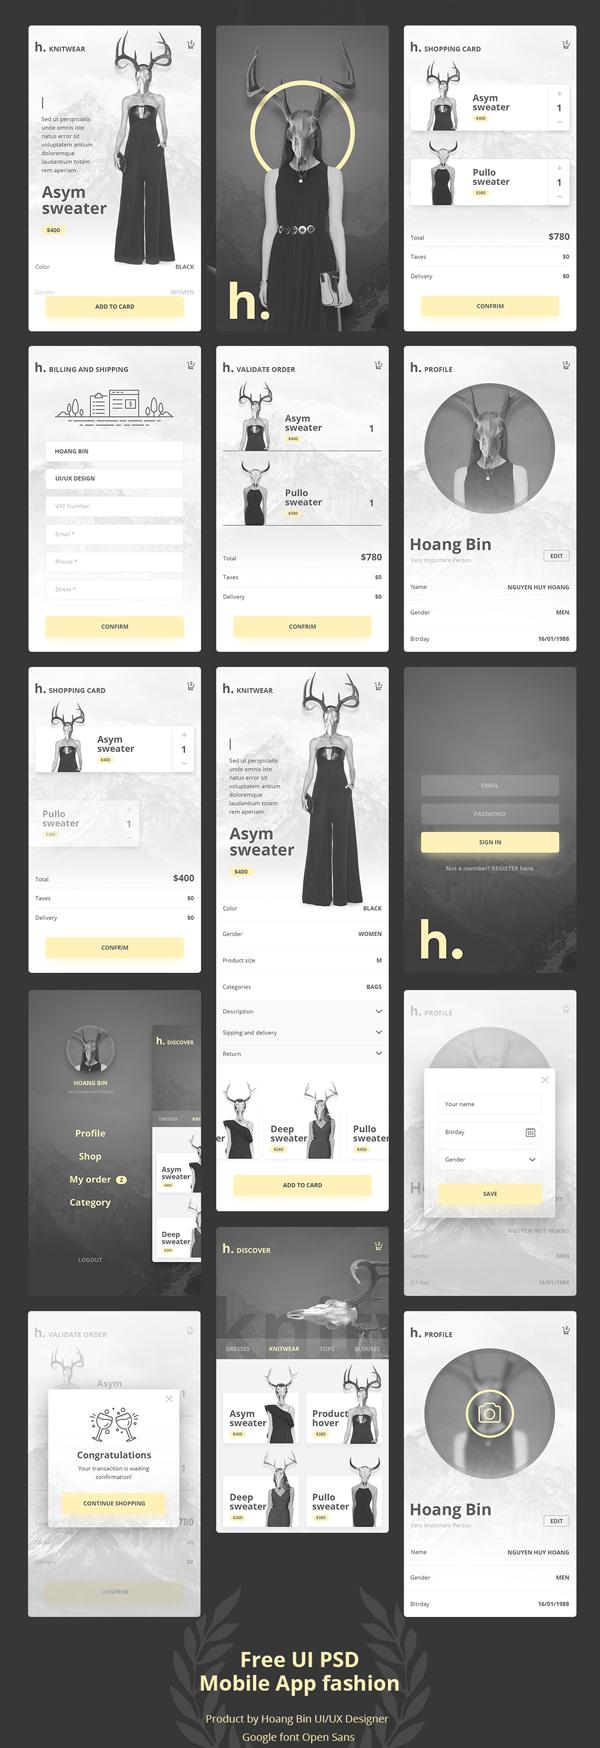 Free UI PSD Mobile App Fashion & Ecommerce ver 2.0